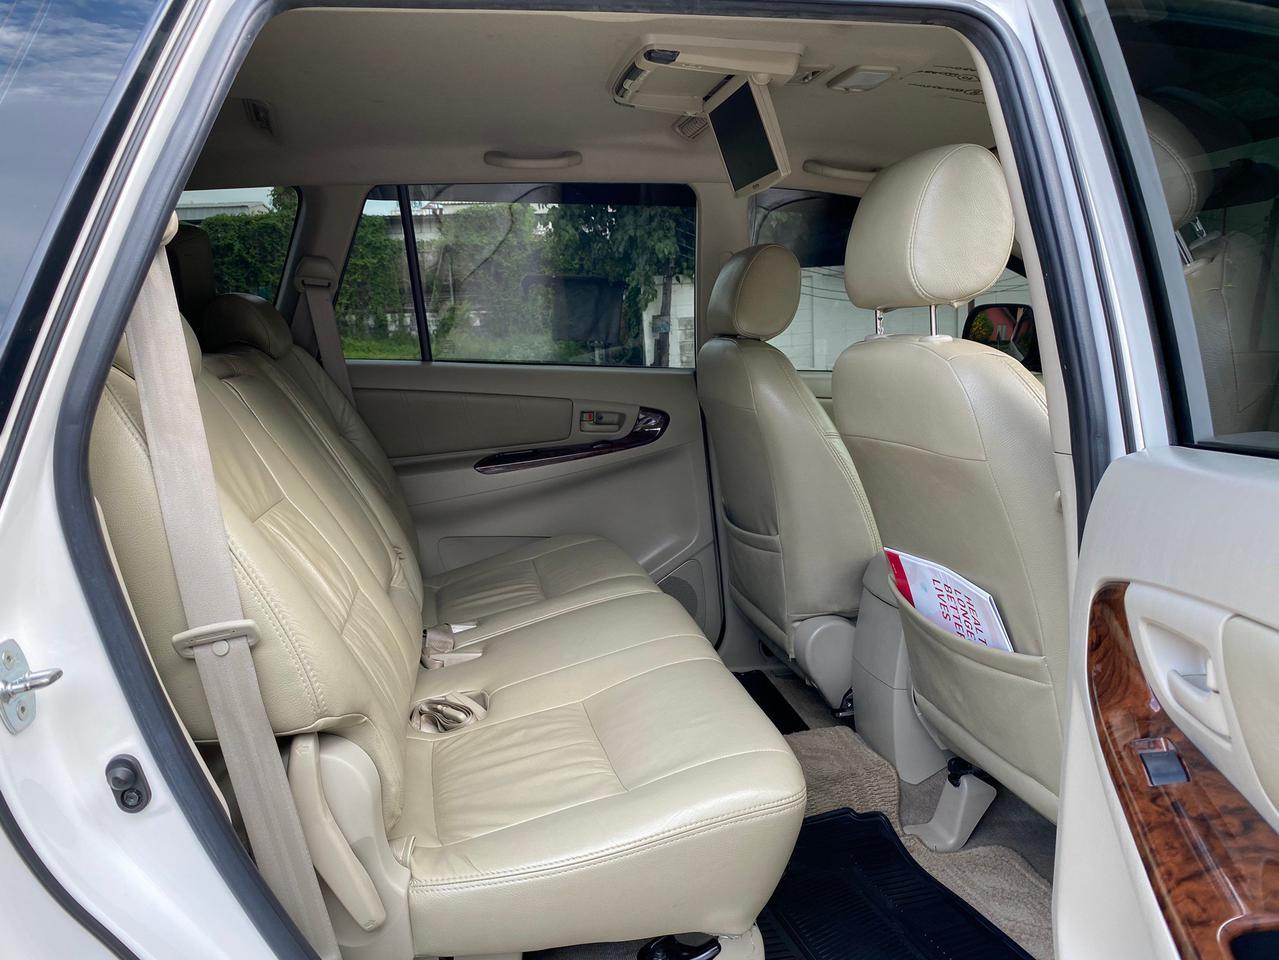 "Toyota Innova 2.0G ออฟชั่น ทีวี จอกลาง กล้องถอยหลังและเซ็นเซอร์ มาให้พร้อมใช้งานเลยครับ"" การเชื่อมต่อ Bluetooth  รูปที่ 6"